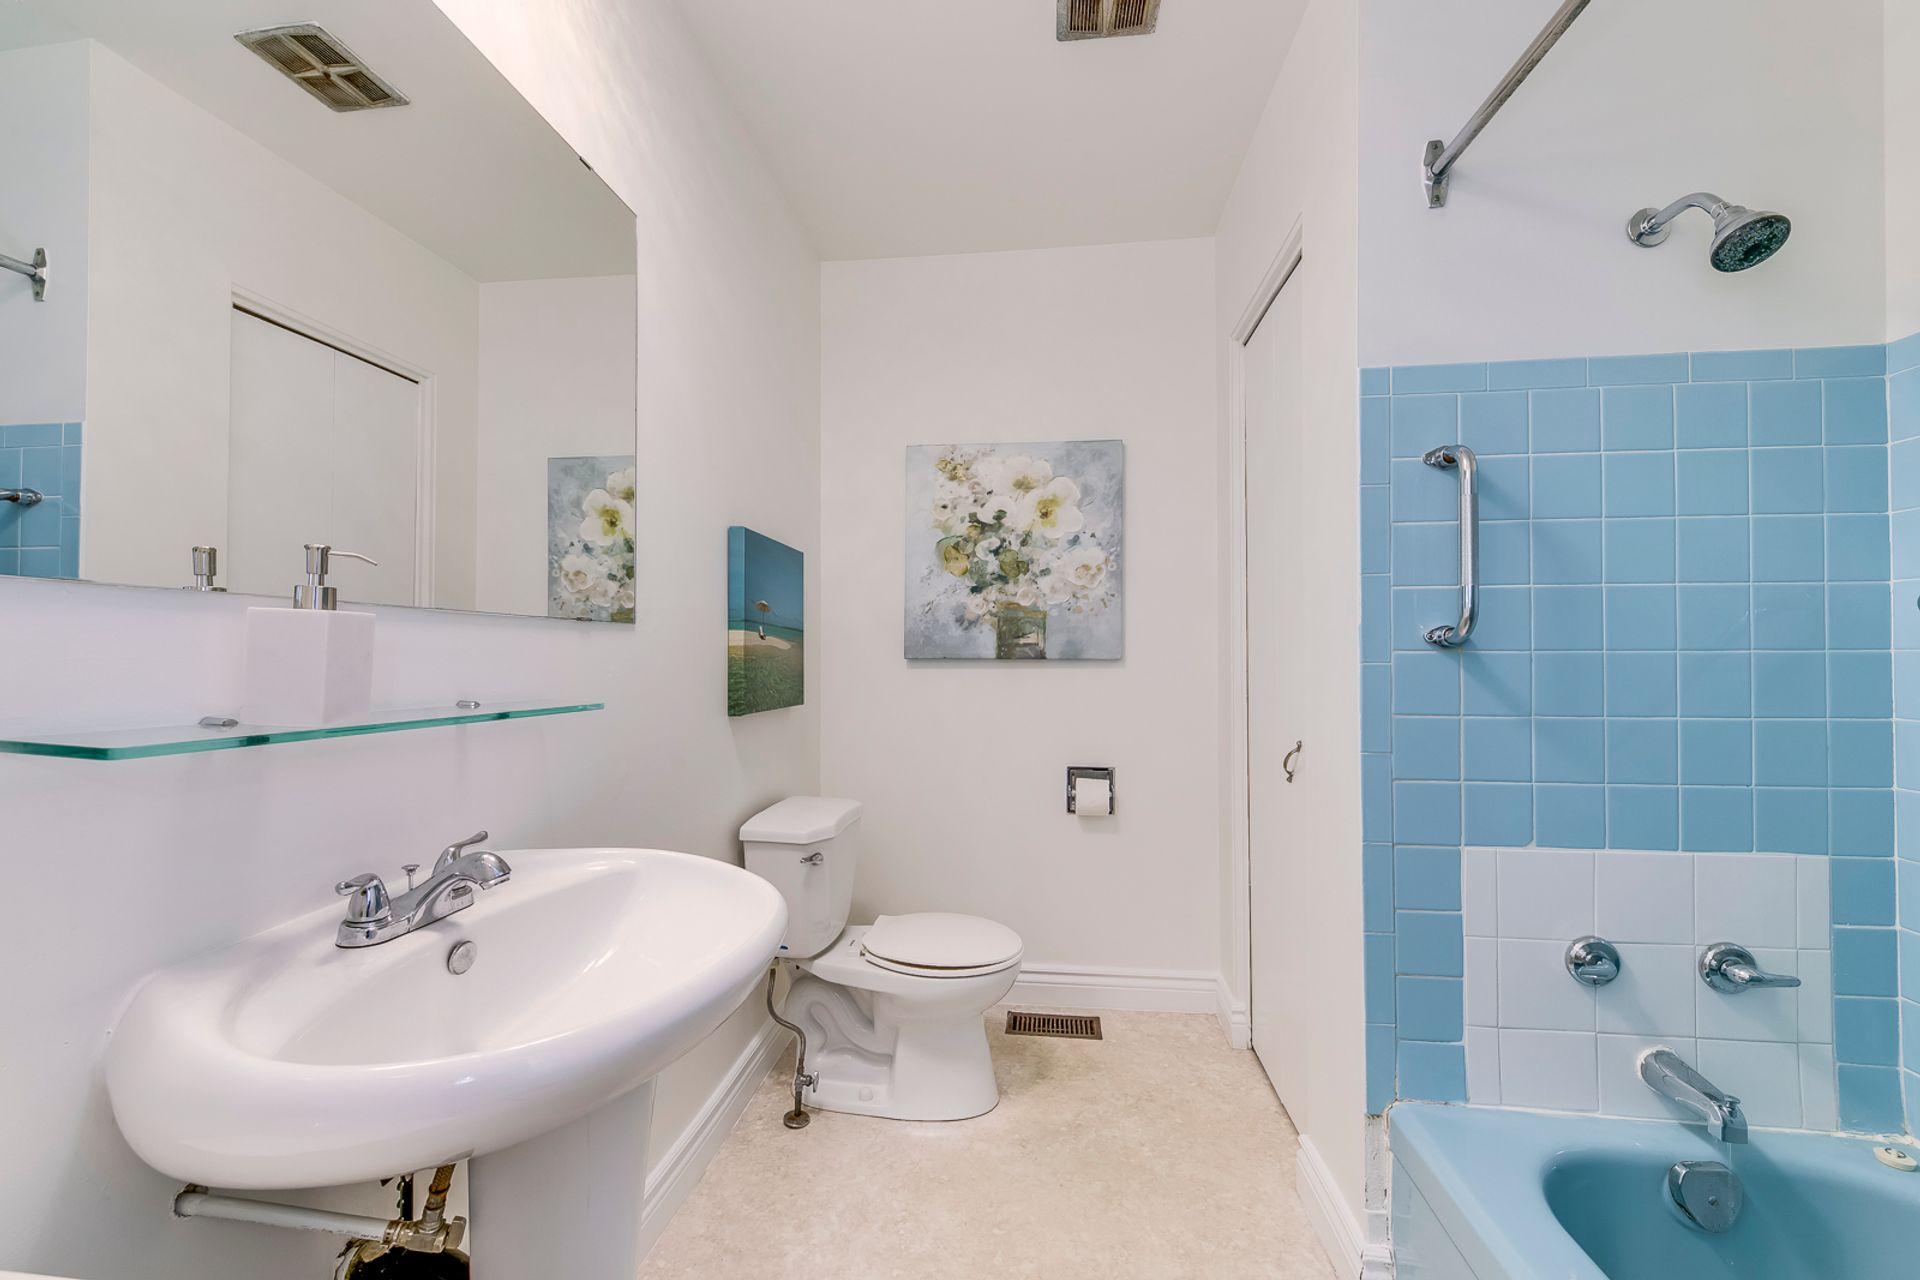 Main Bathroom -1247 Kensington Park Rd, Oakville - Elite3 & Team at 1247 Kensington Park Road, Iroquois Ridge South, Oakville